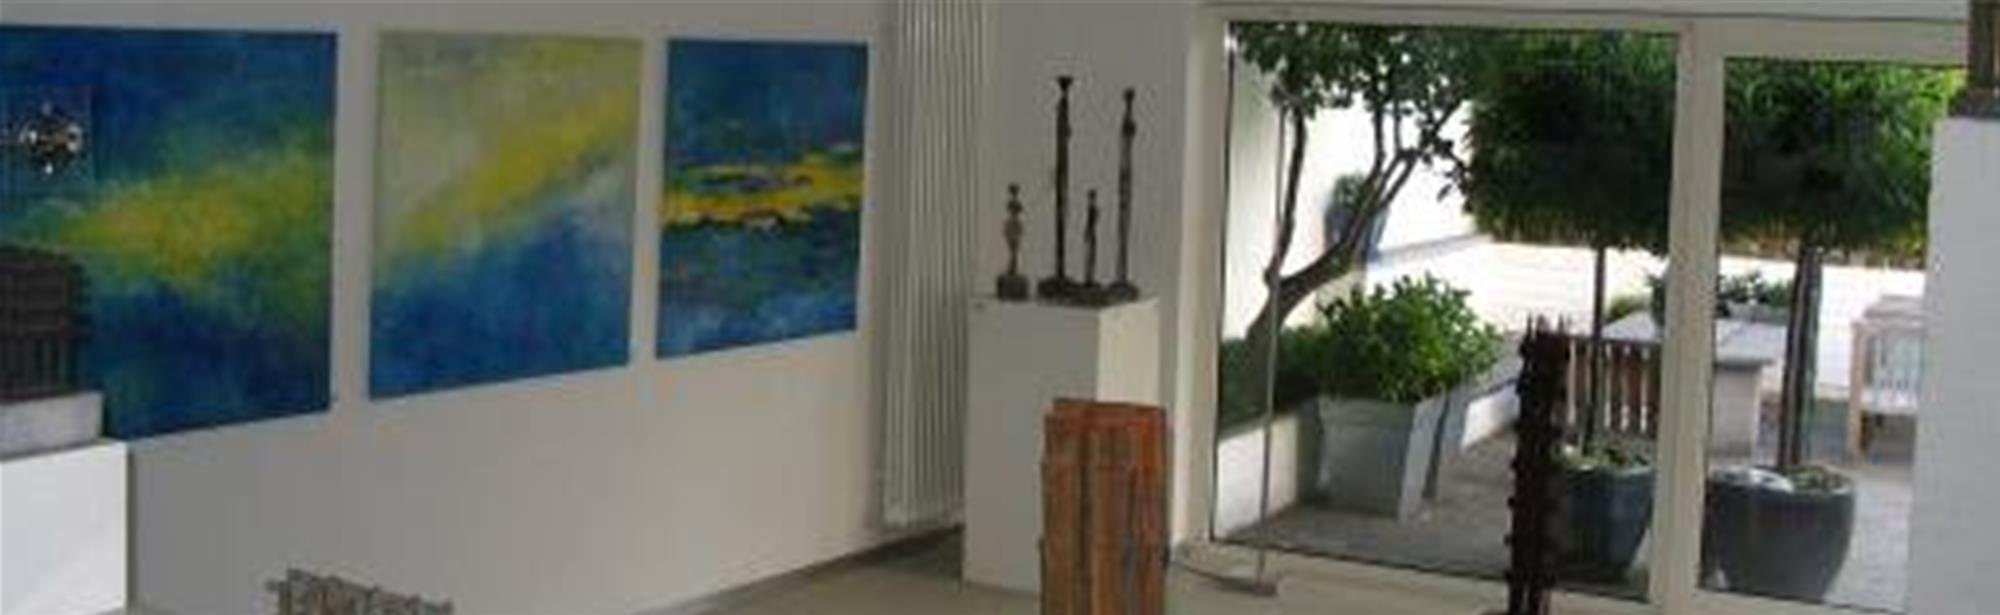 Ipomal Galerie en Kunstuitleen